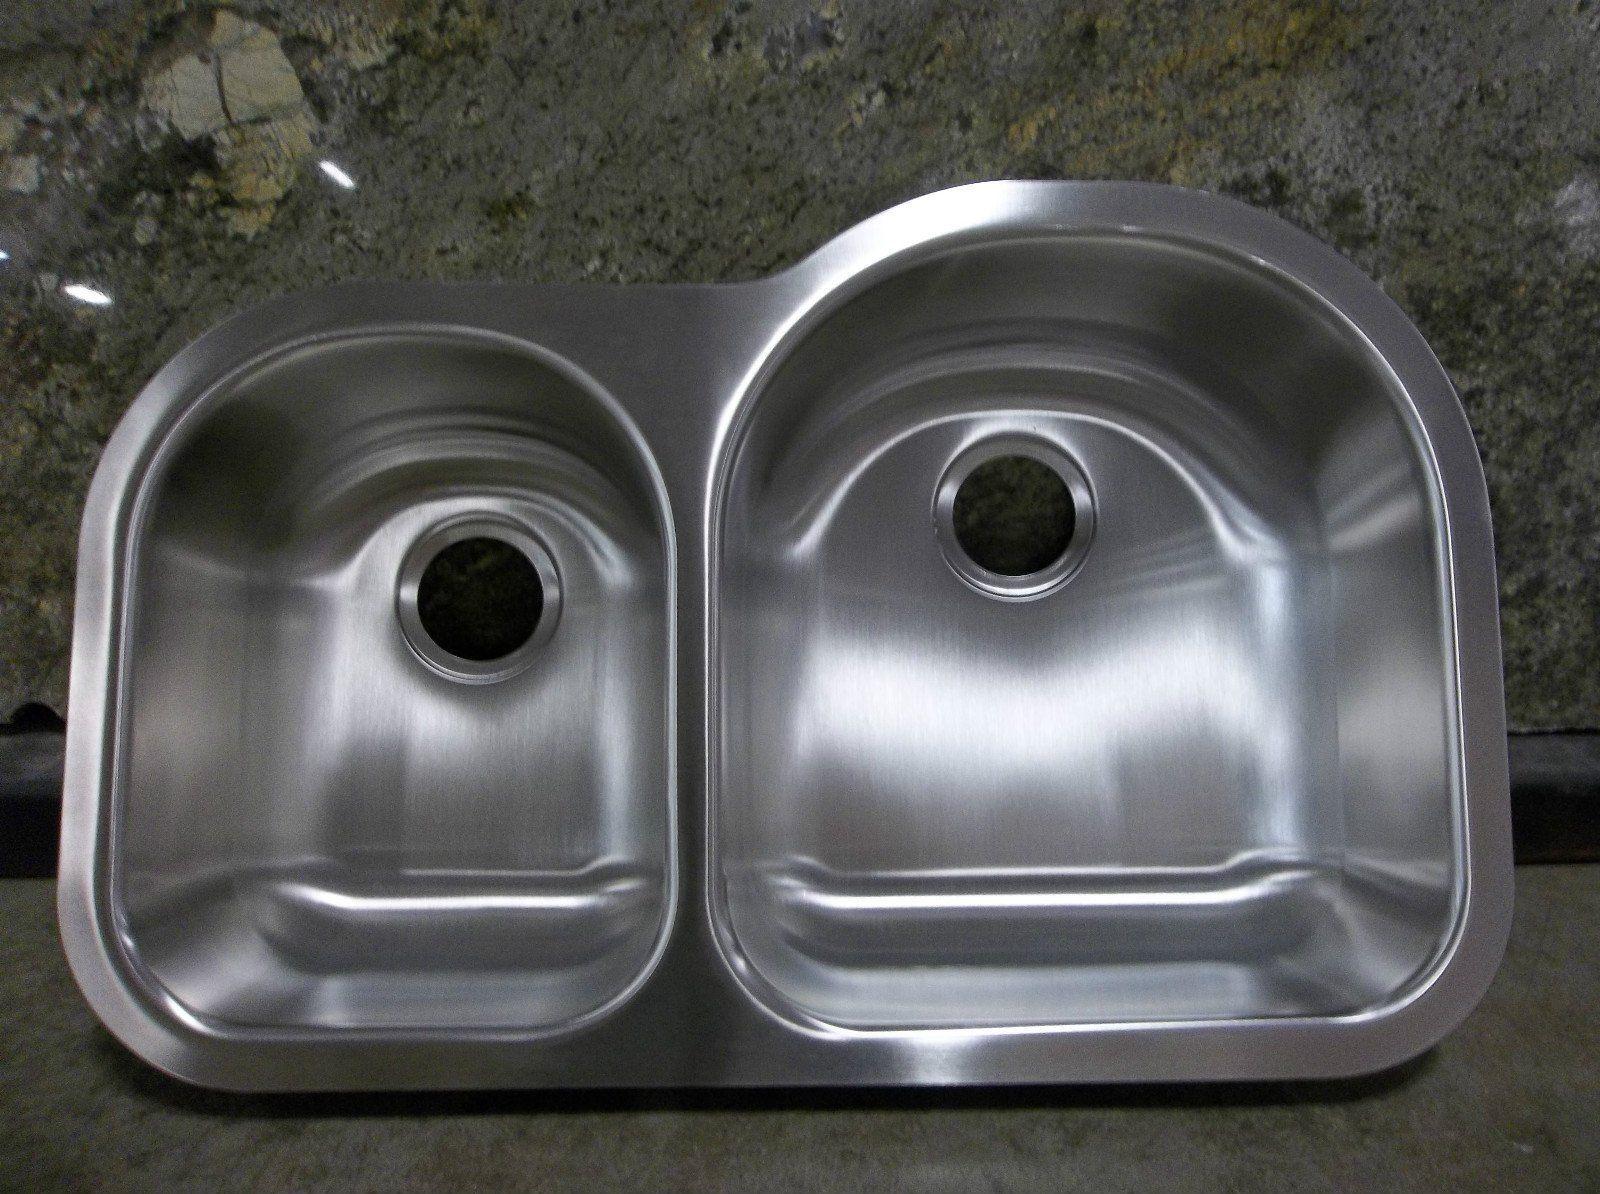 Elkay Revere NCFU 3119L 30/70 Undermount Stainless Steel 18 Gauge Double  Bowl Kitchen Sink